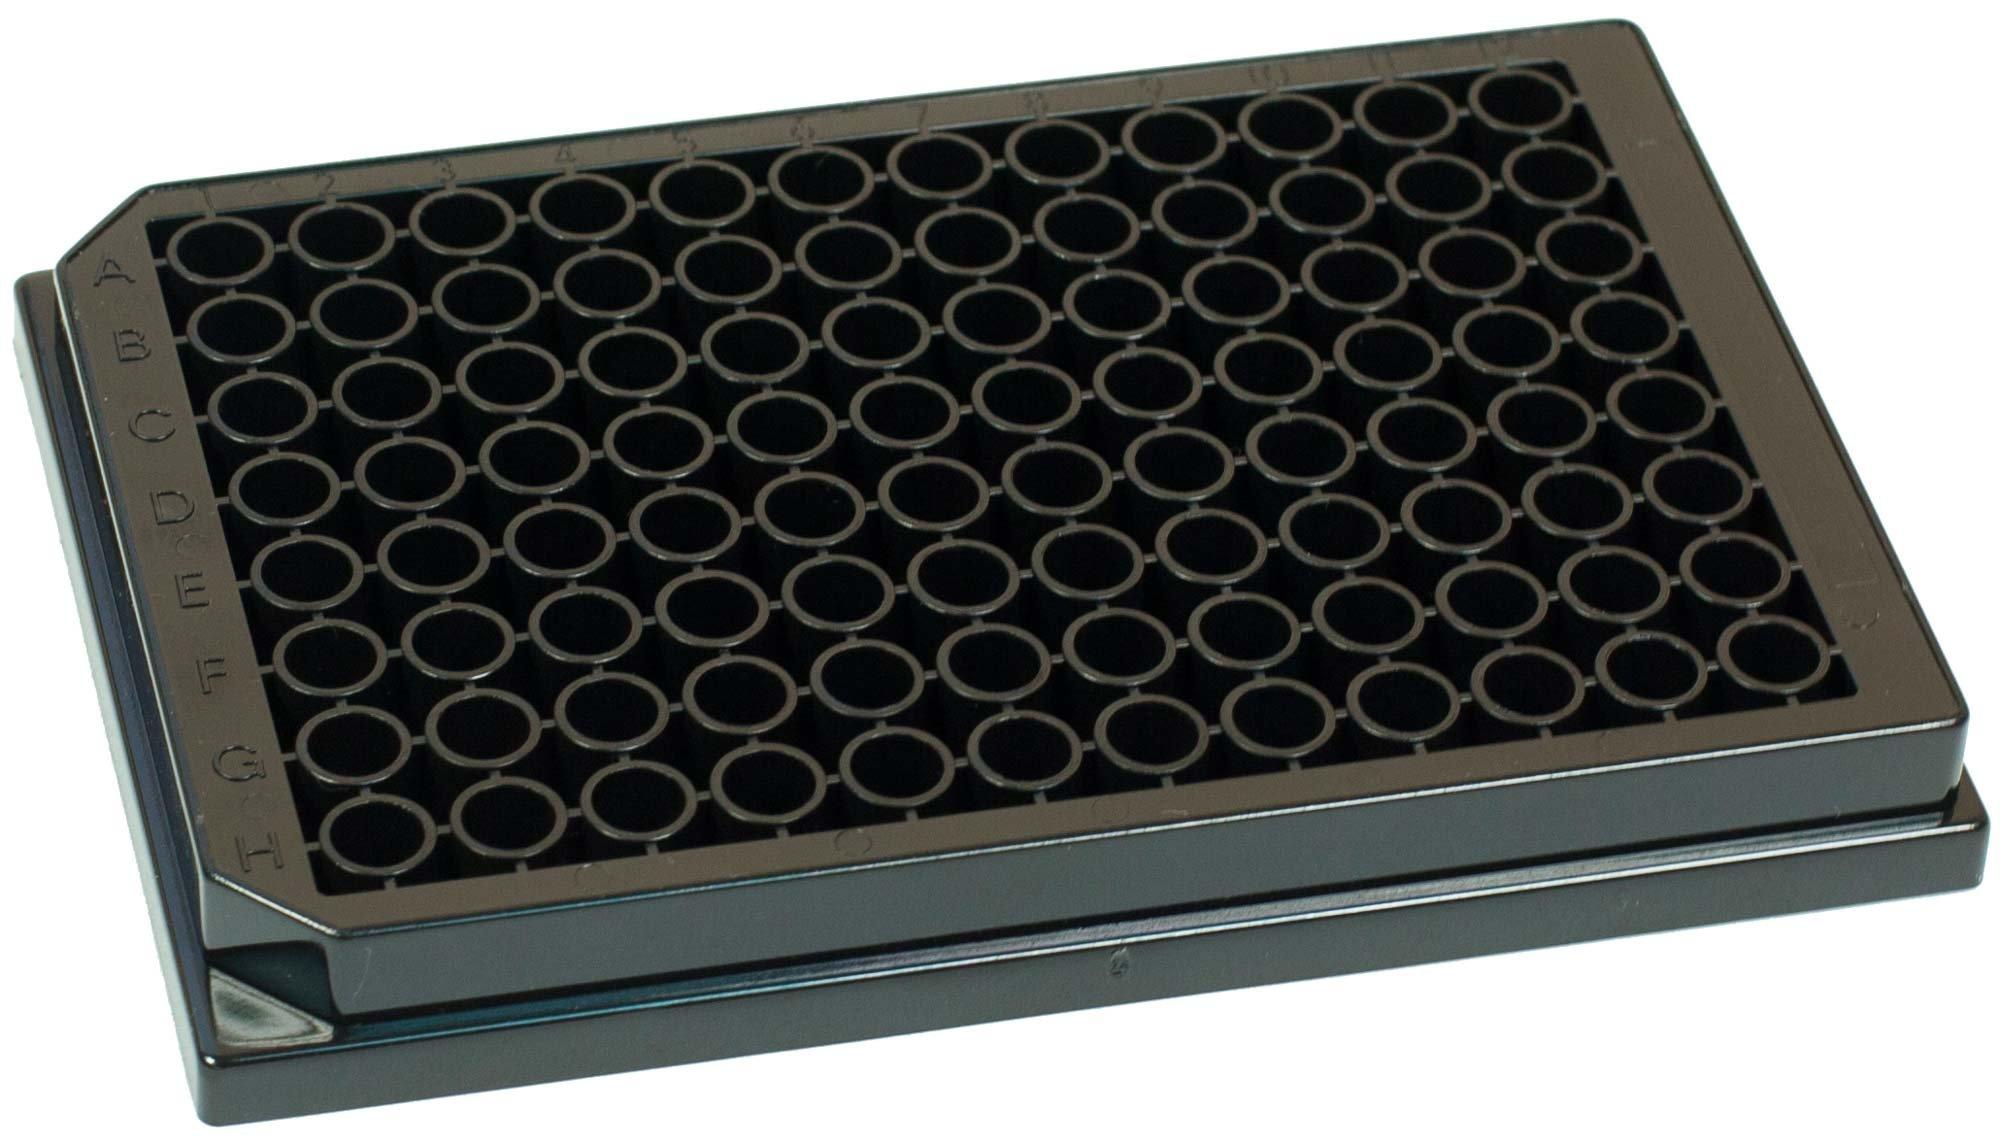 BRANDplates pureGrade PS Non-Treated Non-Sterile Surface 96-Well Plate - Black, Transparent F-Bottom